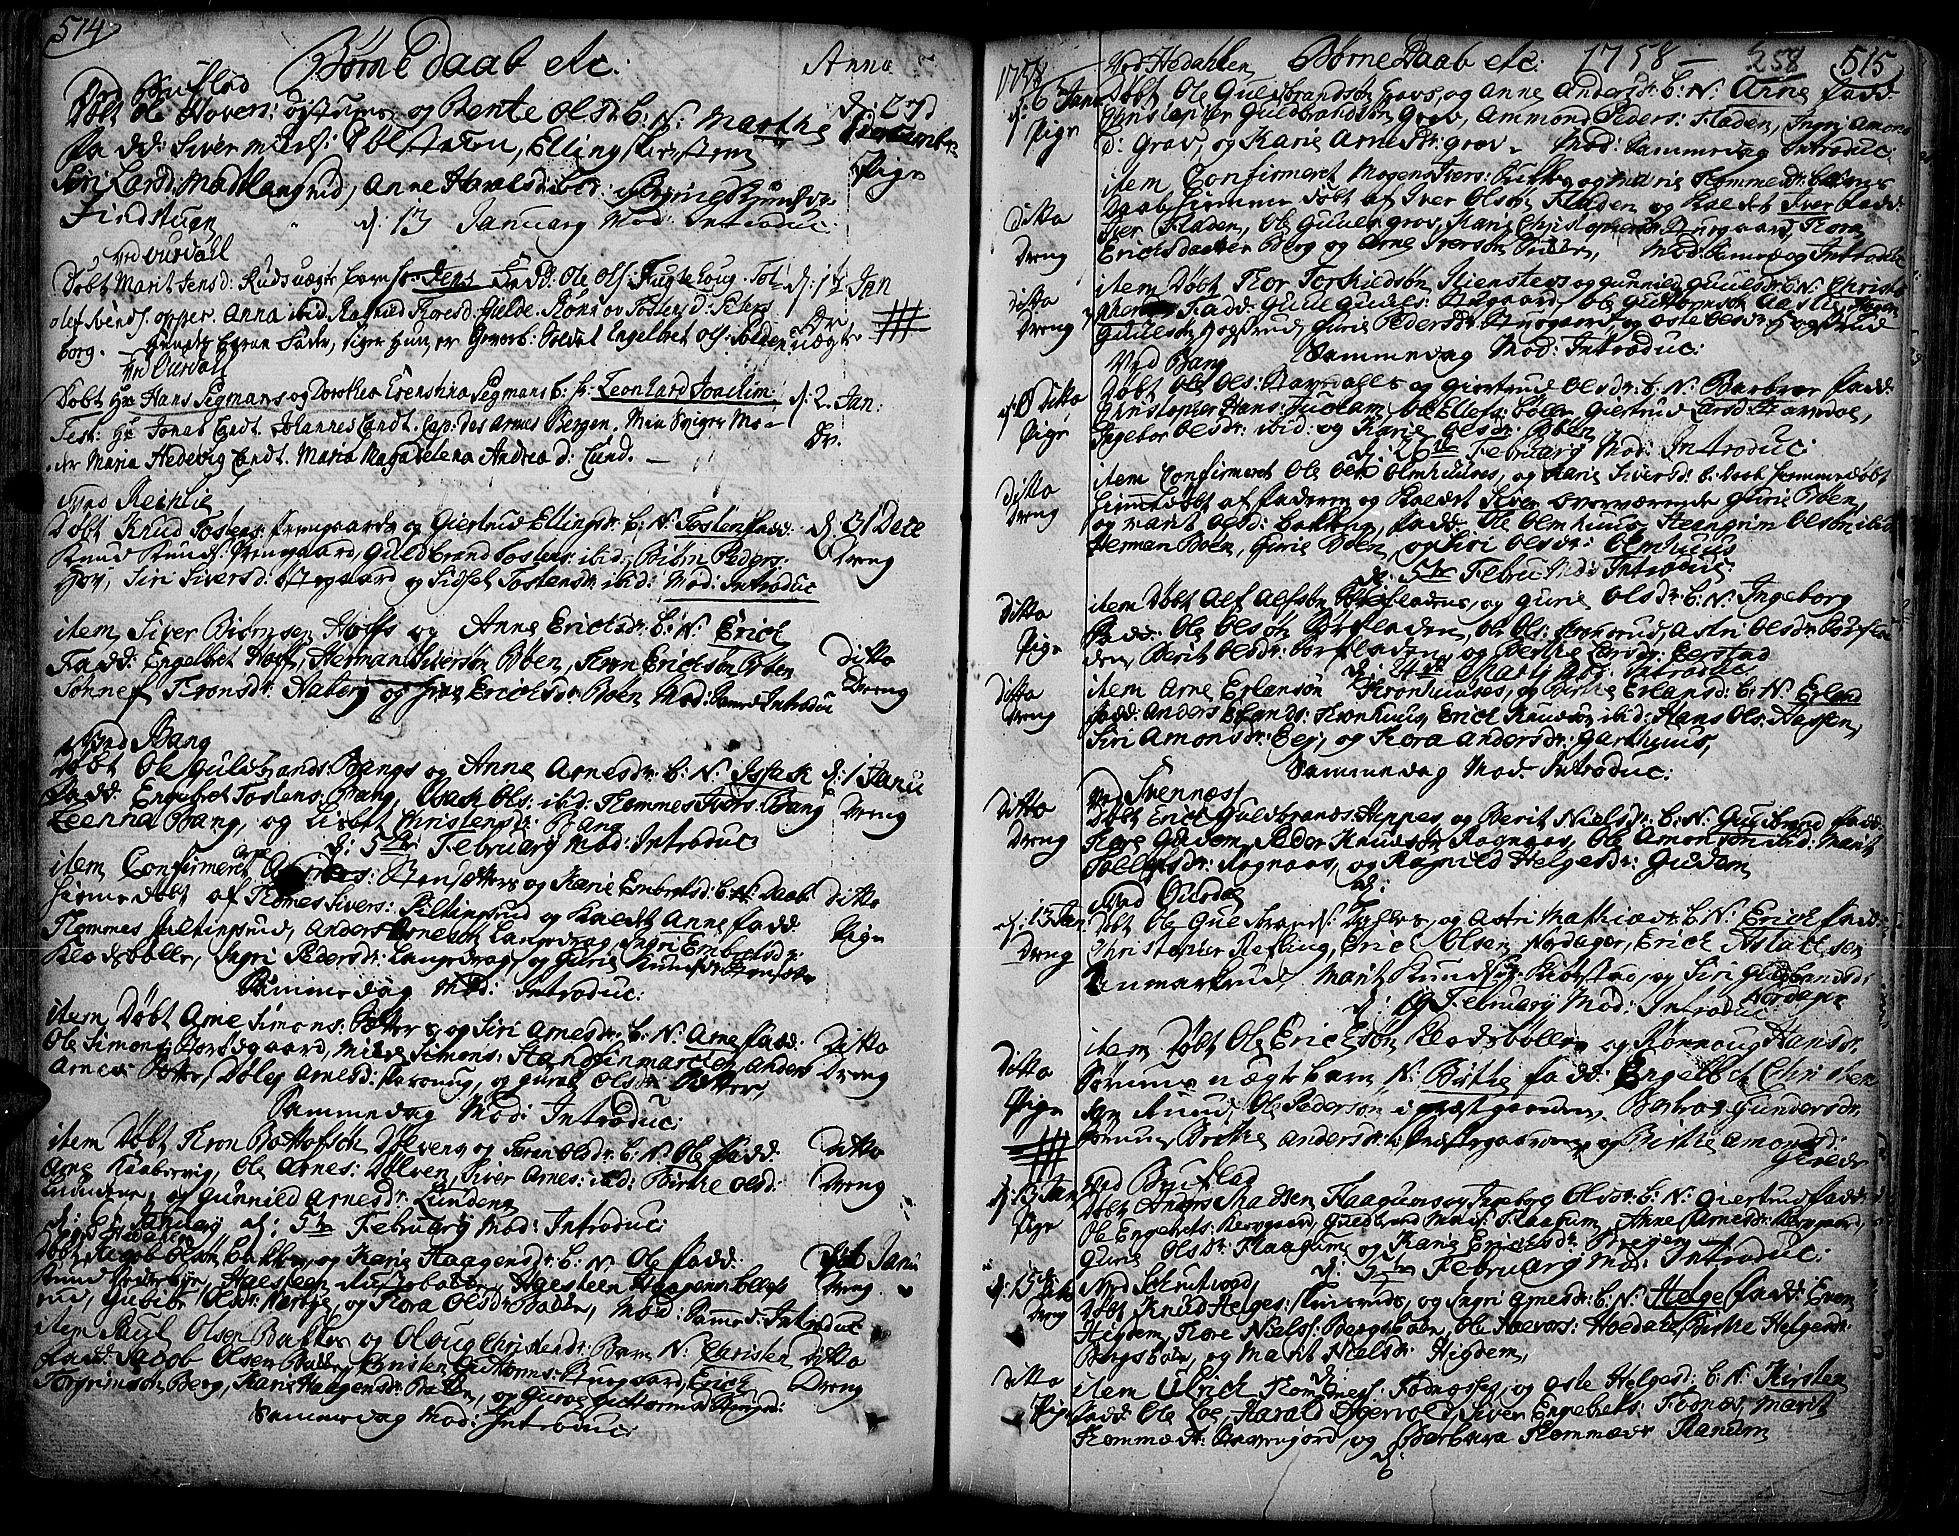 SAH, Aurdal prestekontor, Ministerialbok nr. 4, 1730-1762, s. 514-515